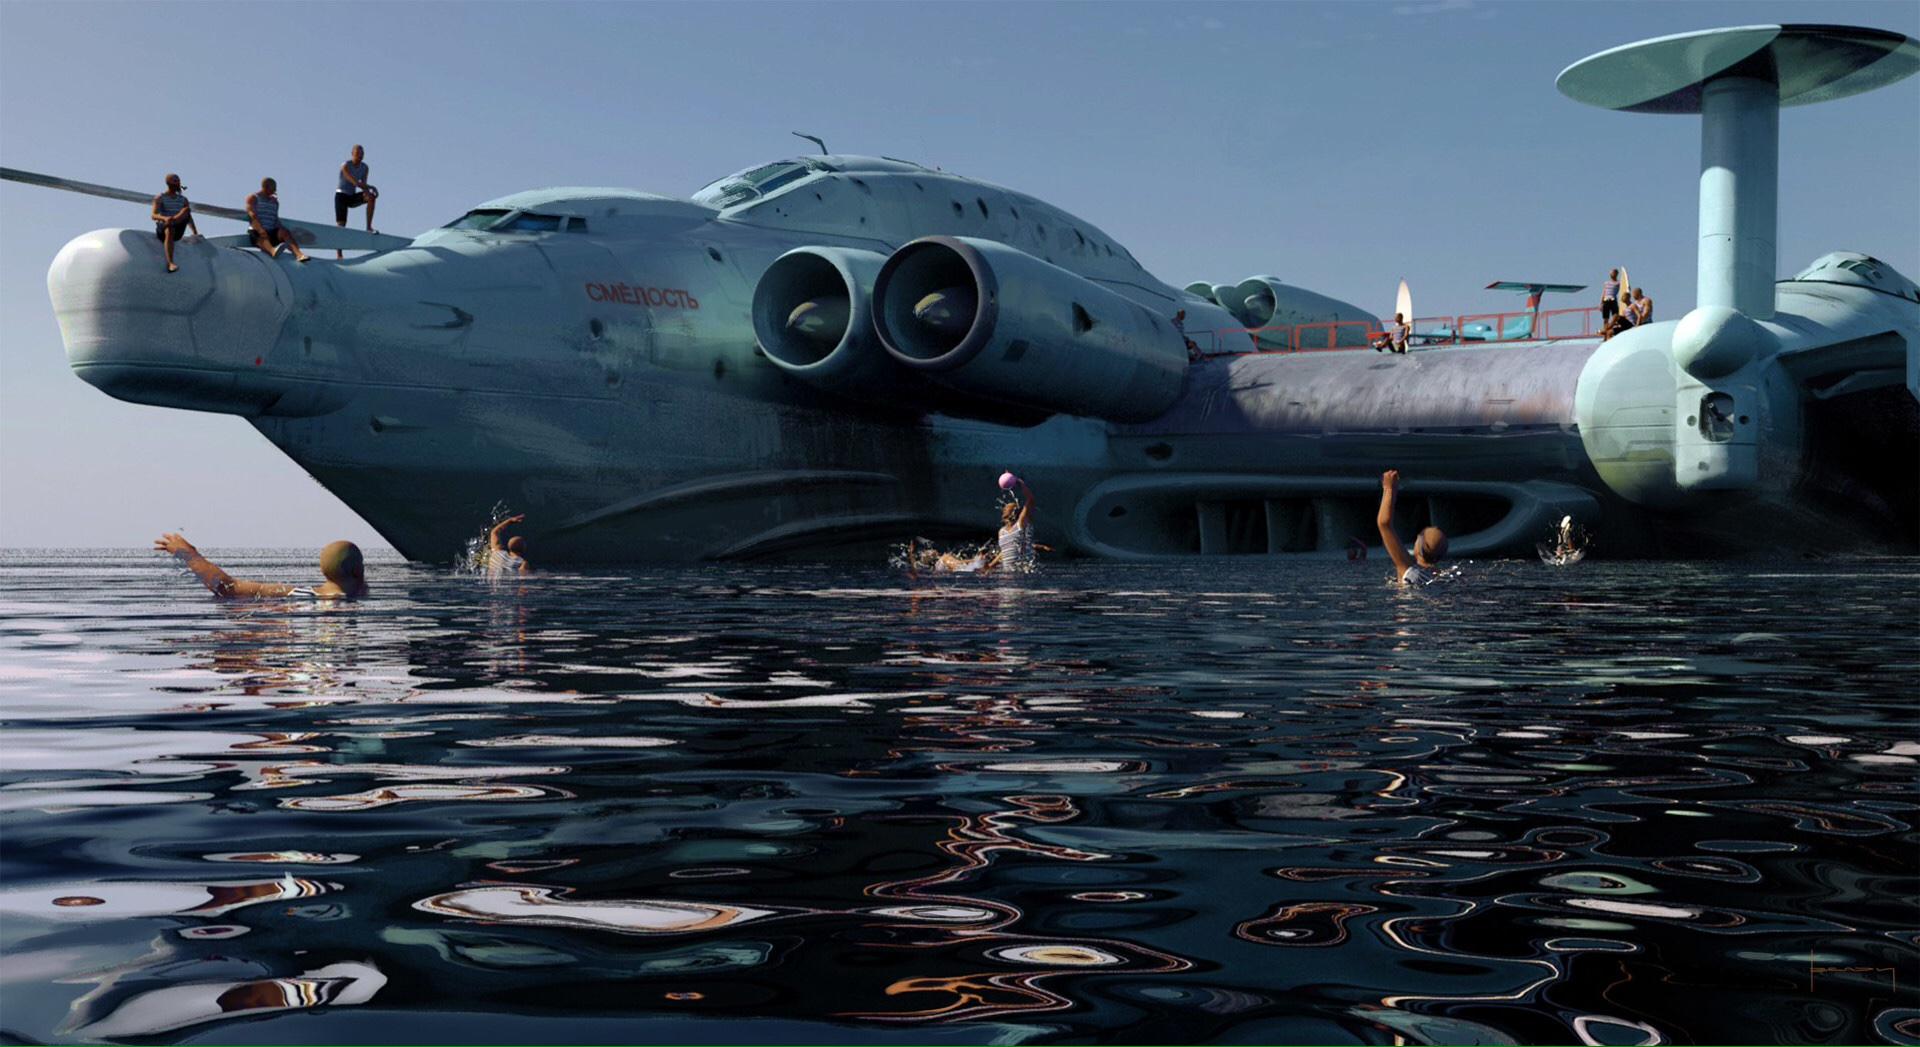 The Futuristic Concept Art Of Alex Jay Brady Sci Fi Artist